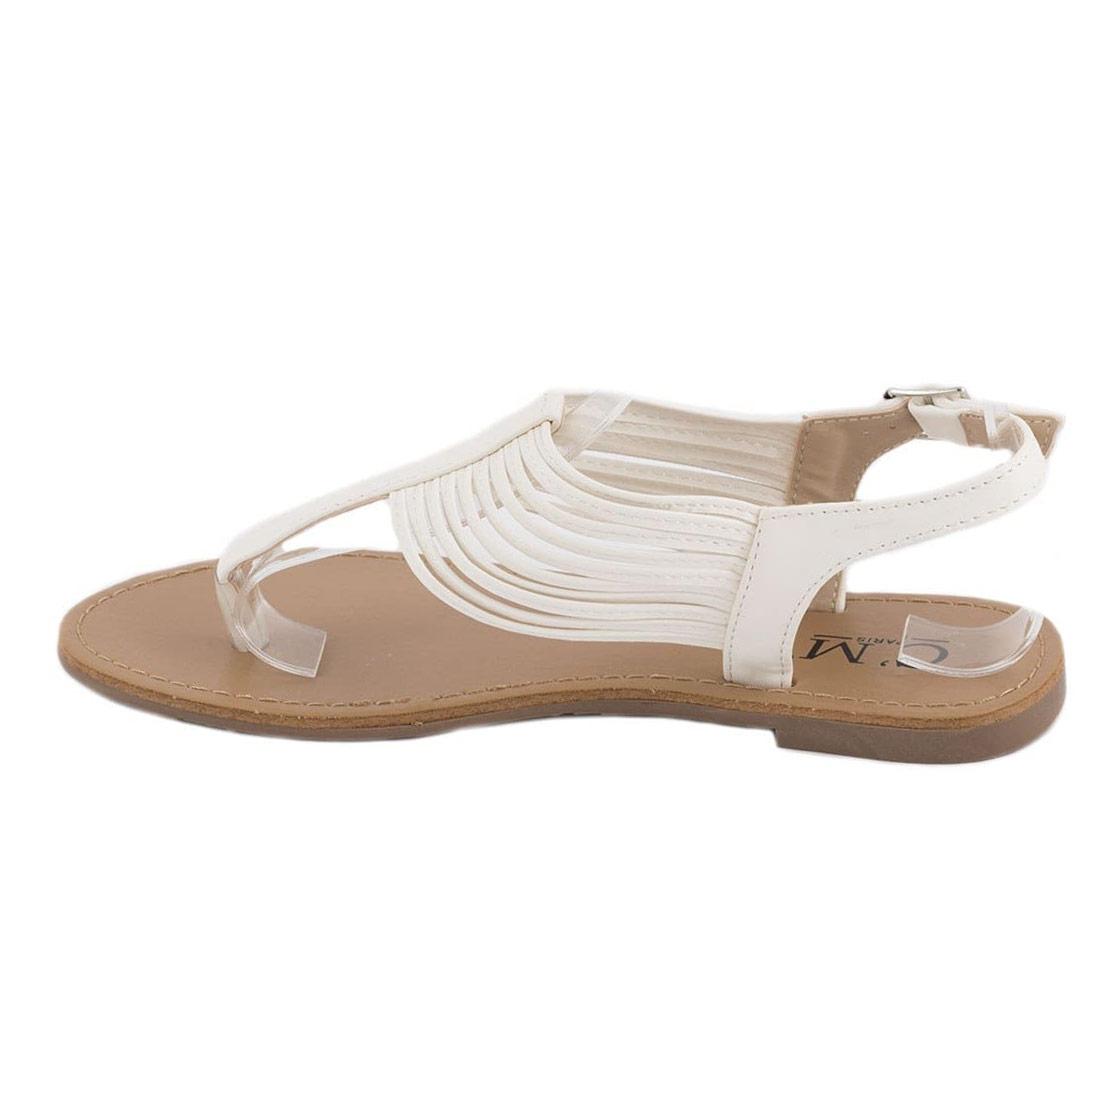 Sandale dama comode albe 8839-85A